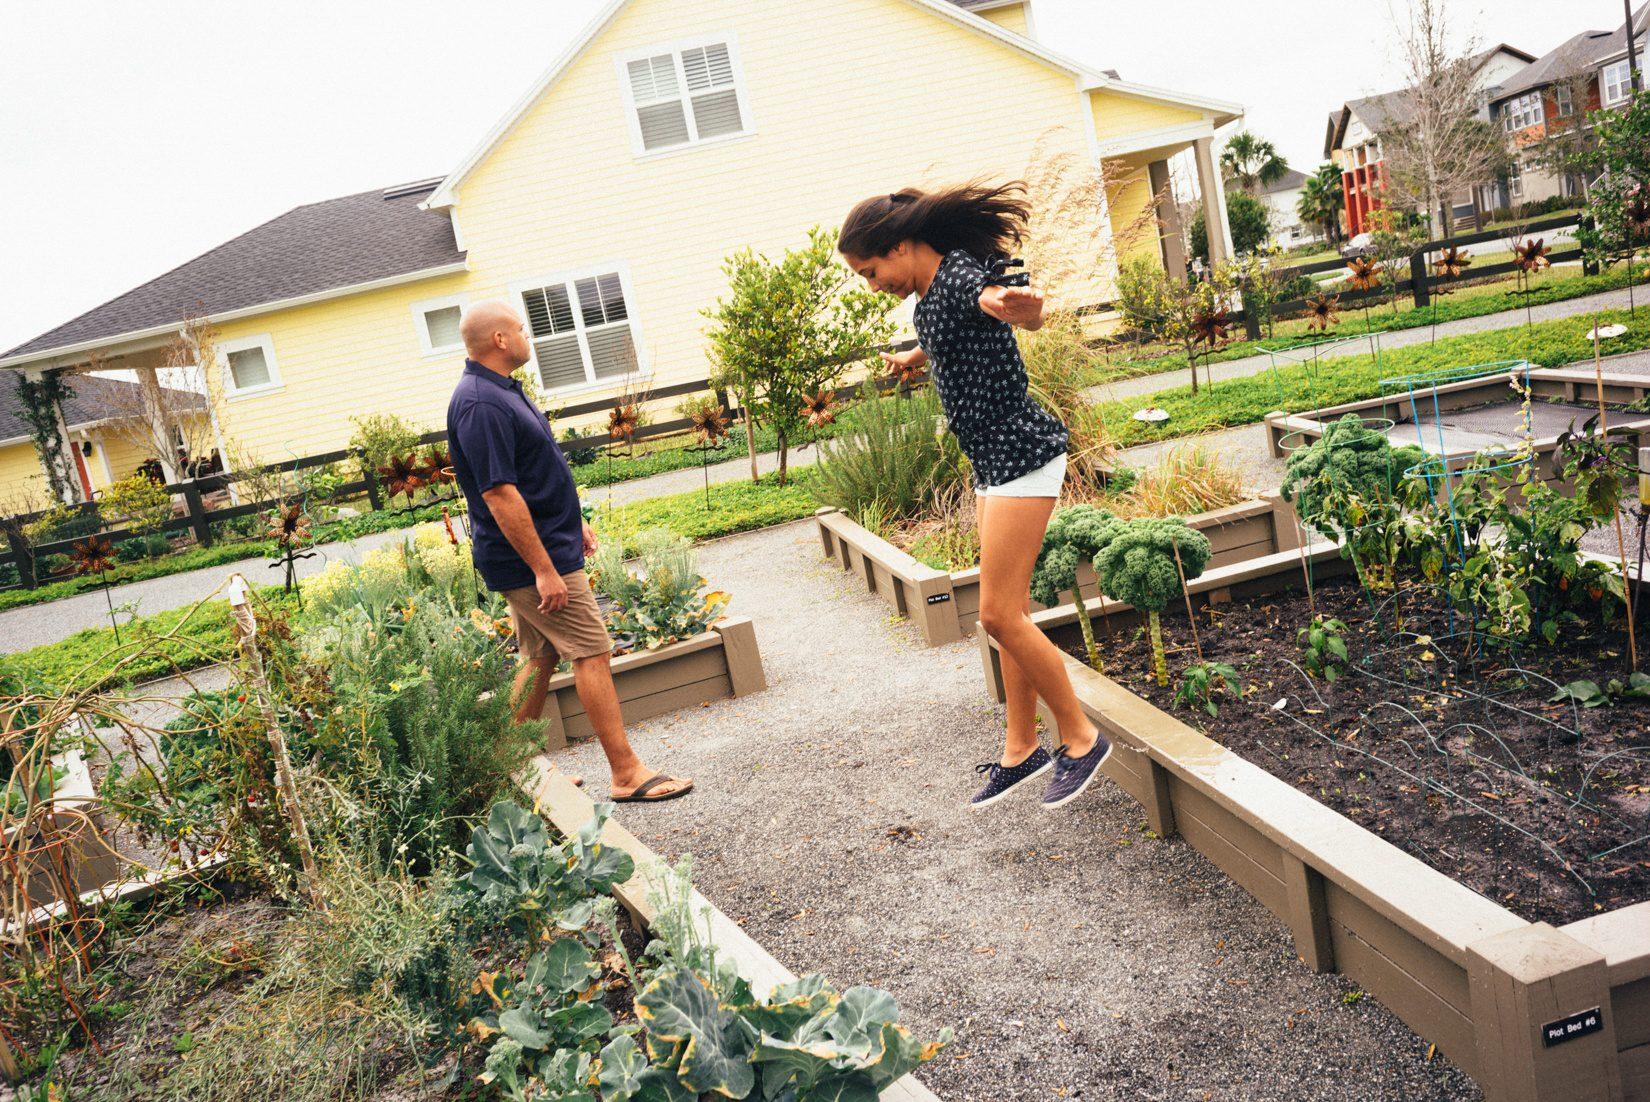 Laureate Park Community Garden - Laureate Blvd 1